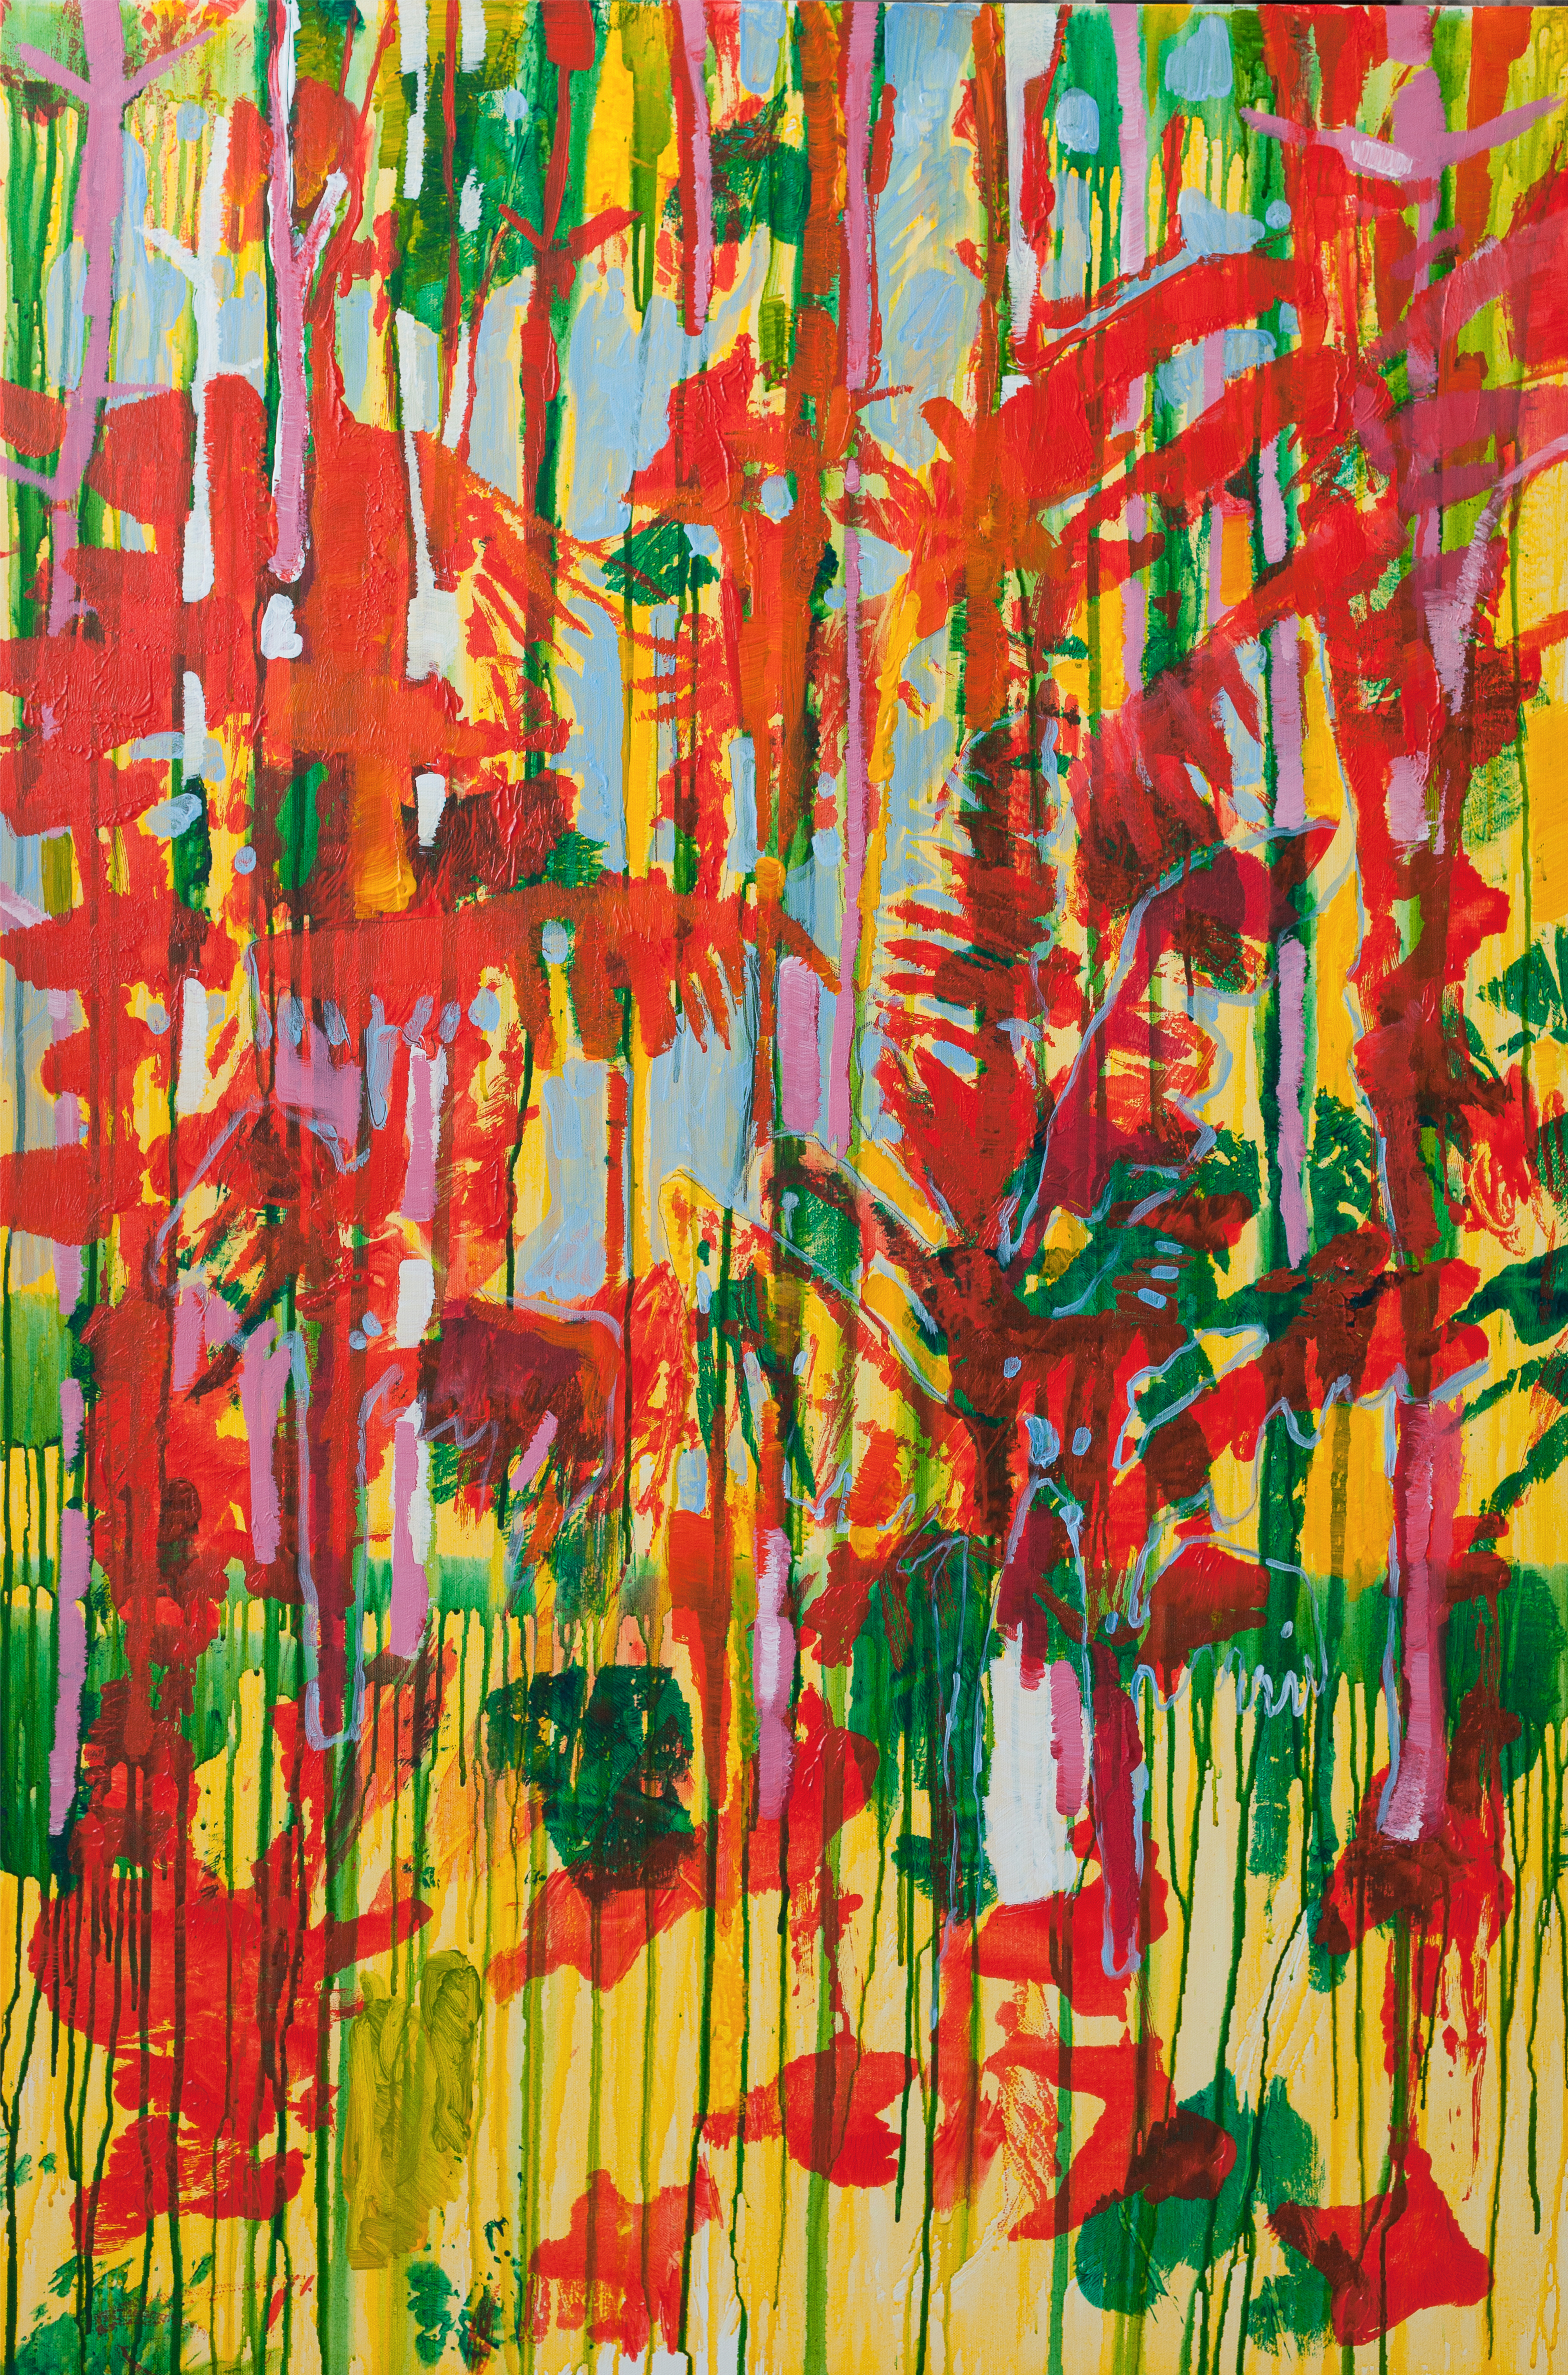 MEKONG 10_acrilic on canvas 120x80